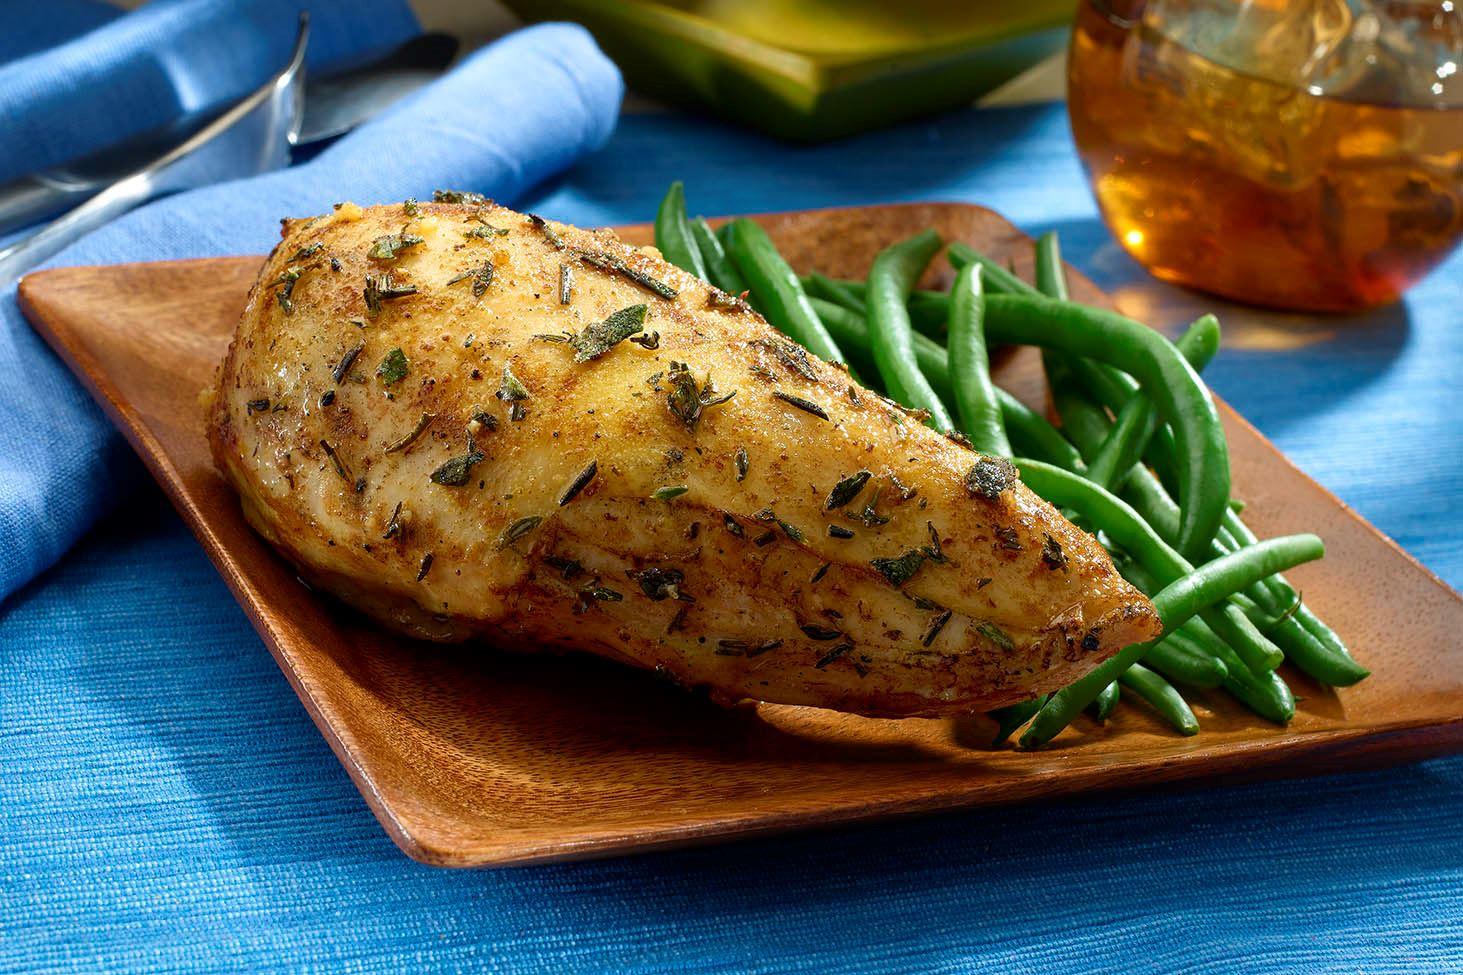 tasty-lemon-and-herb-chicken.jpg